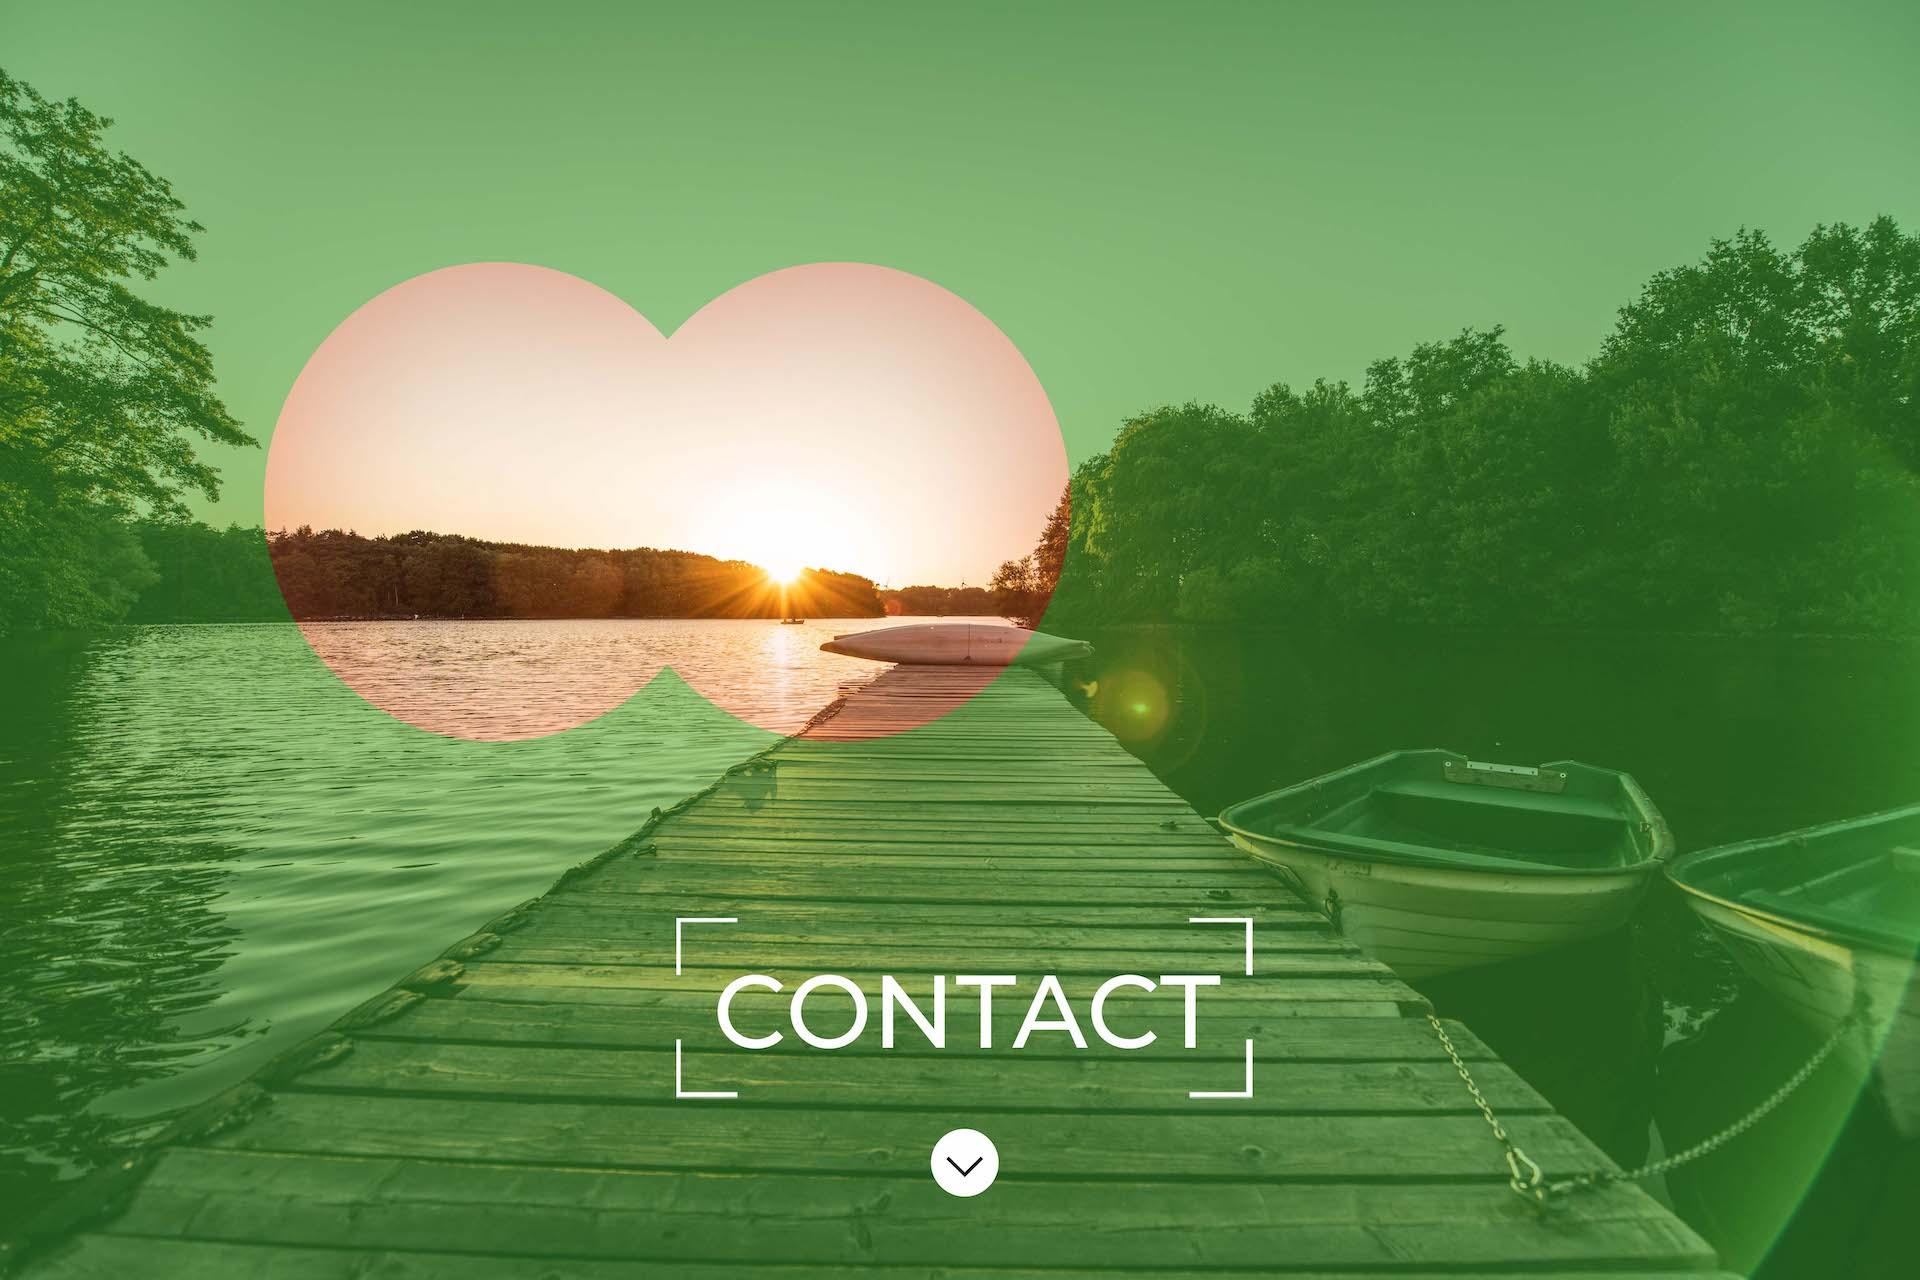 greenmoon-contact